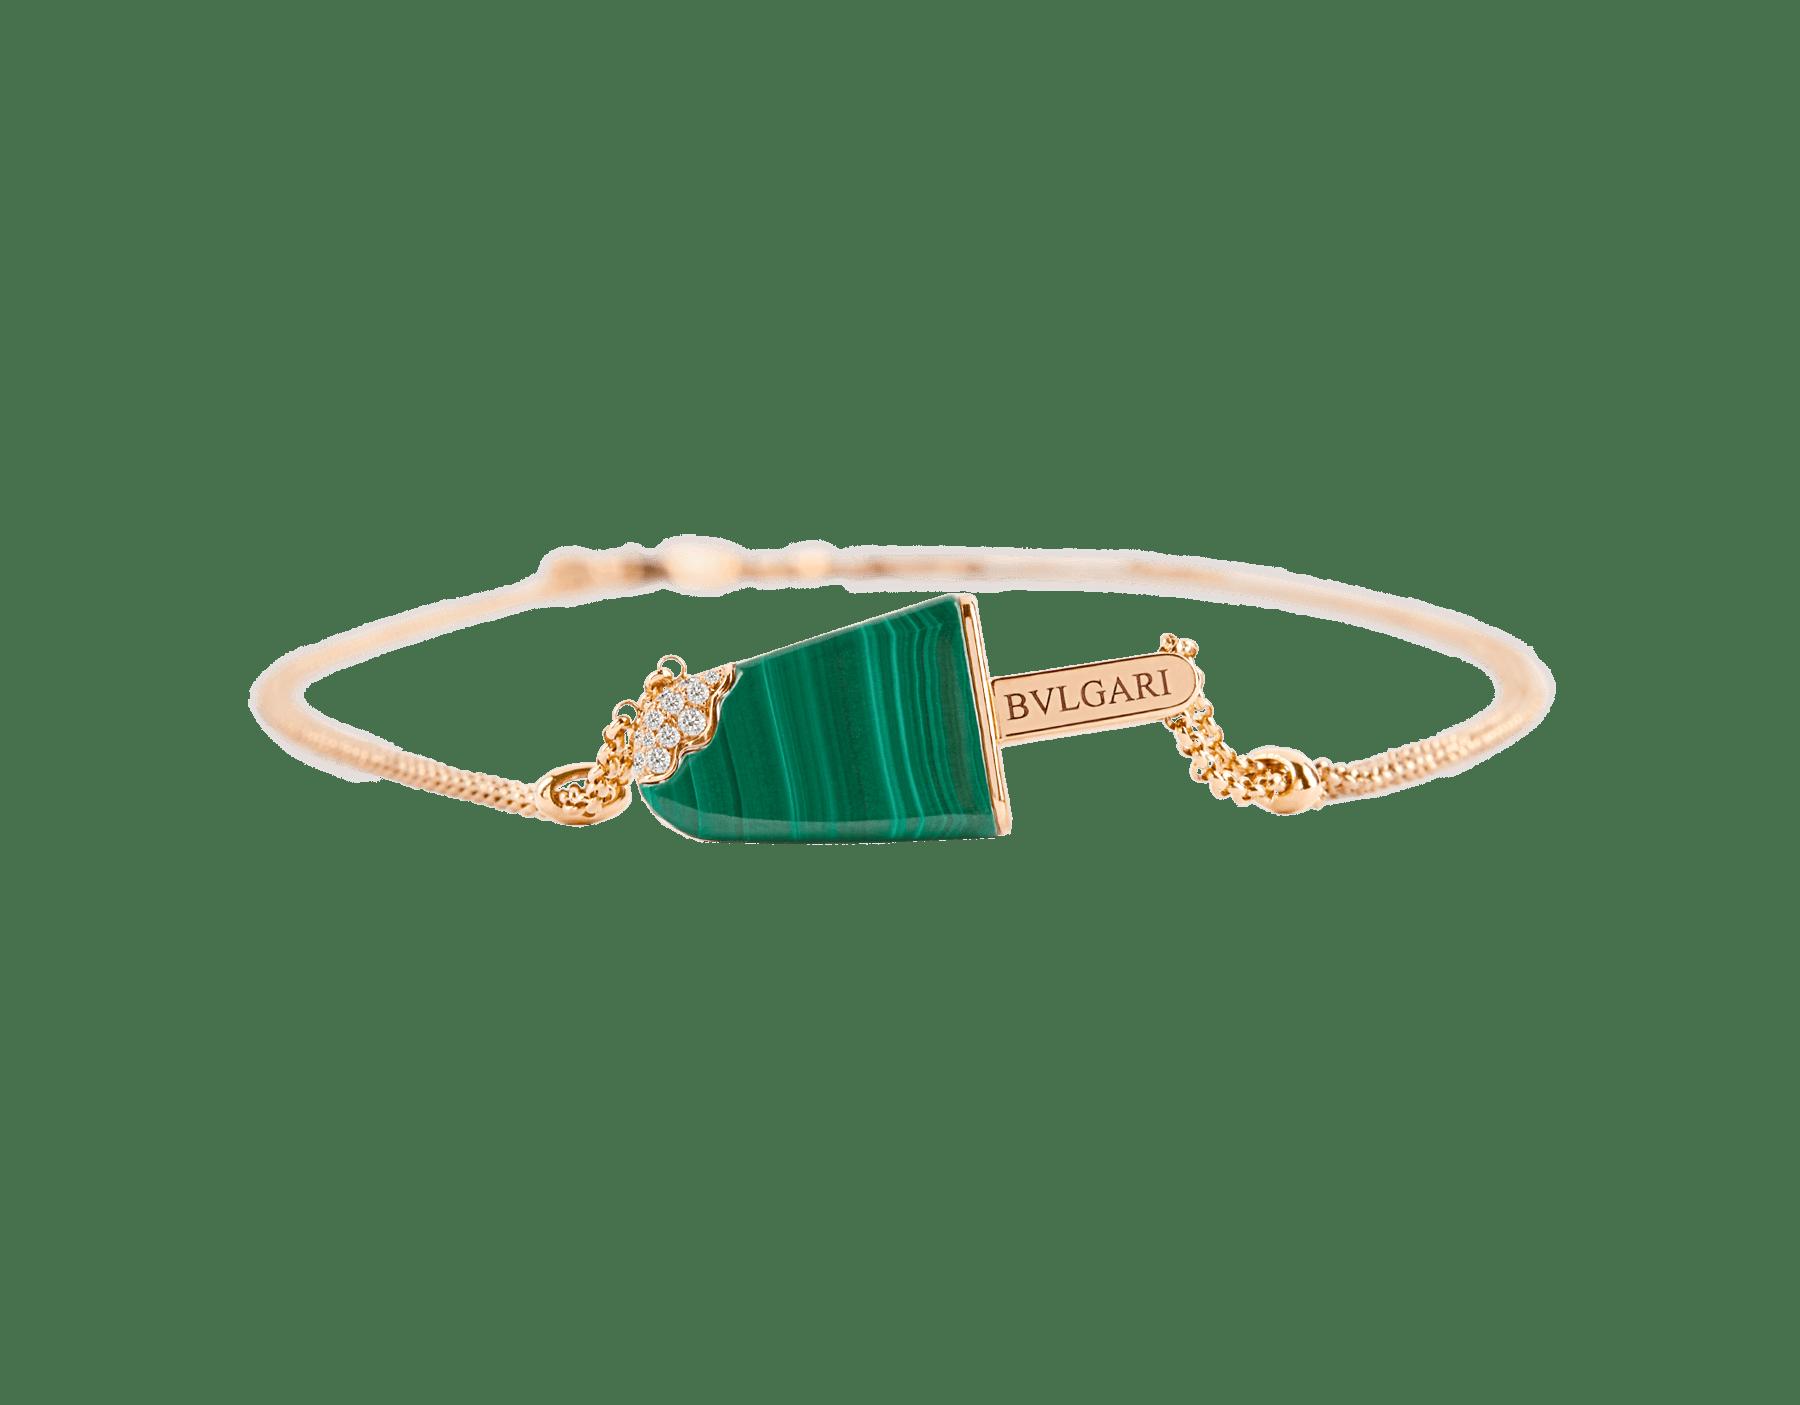 BVLGARI BVLGARI Gelati项链,18K玫瑰金材质,镶嵌孔雀石,饰以密镶钻石 356186 image 2